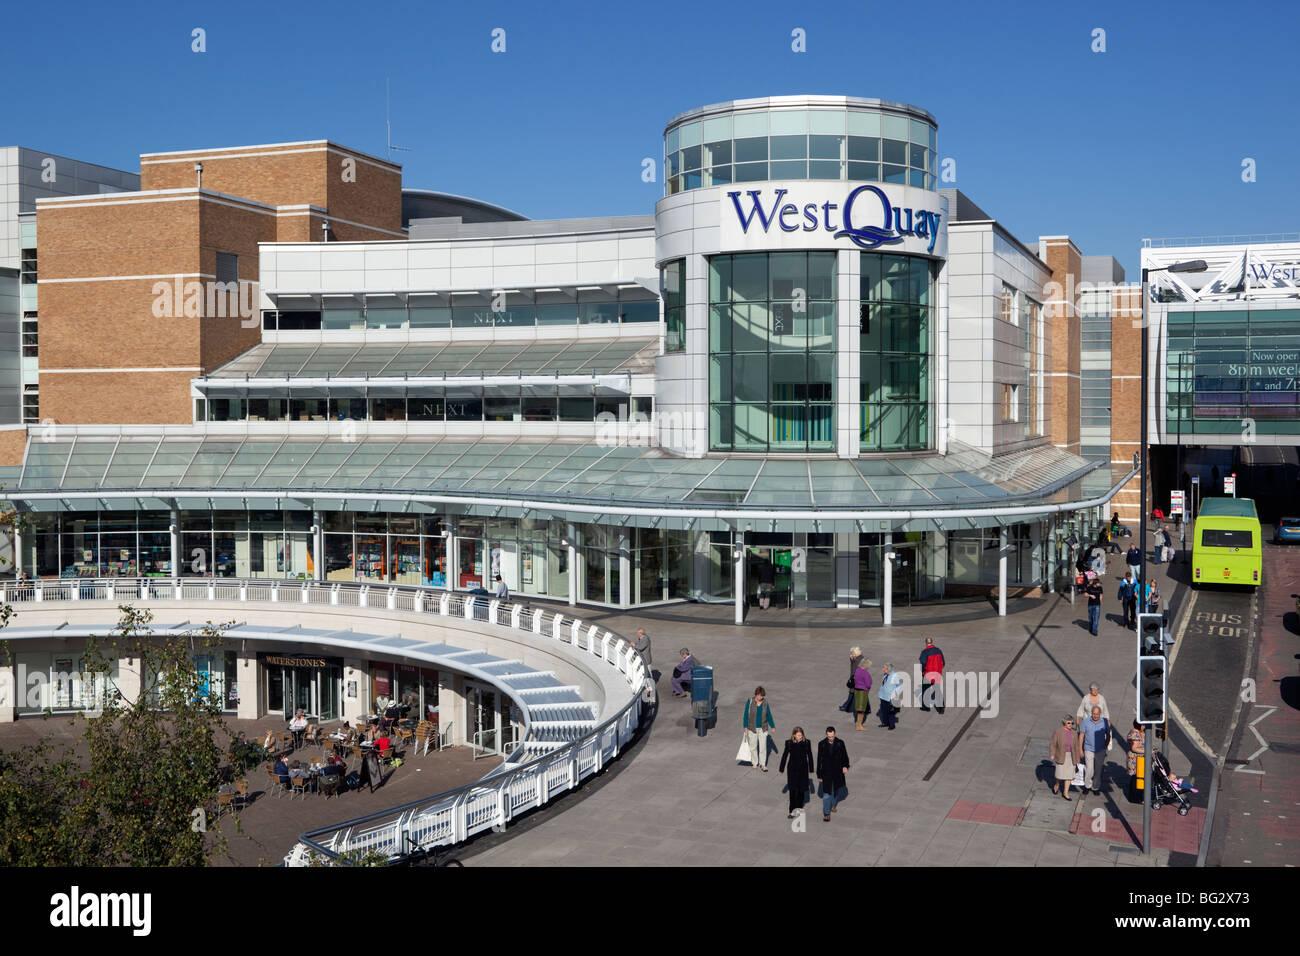 Exterior of West Quay Shopping Centre - Stock Image